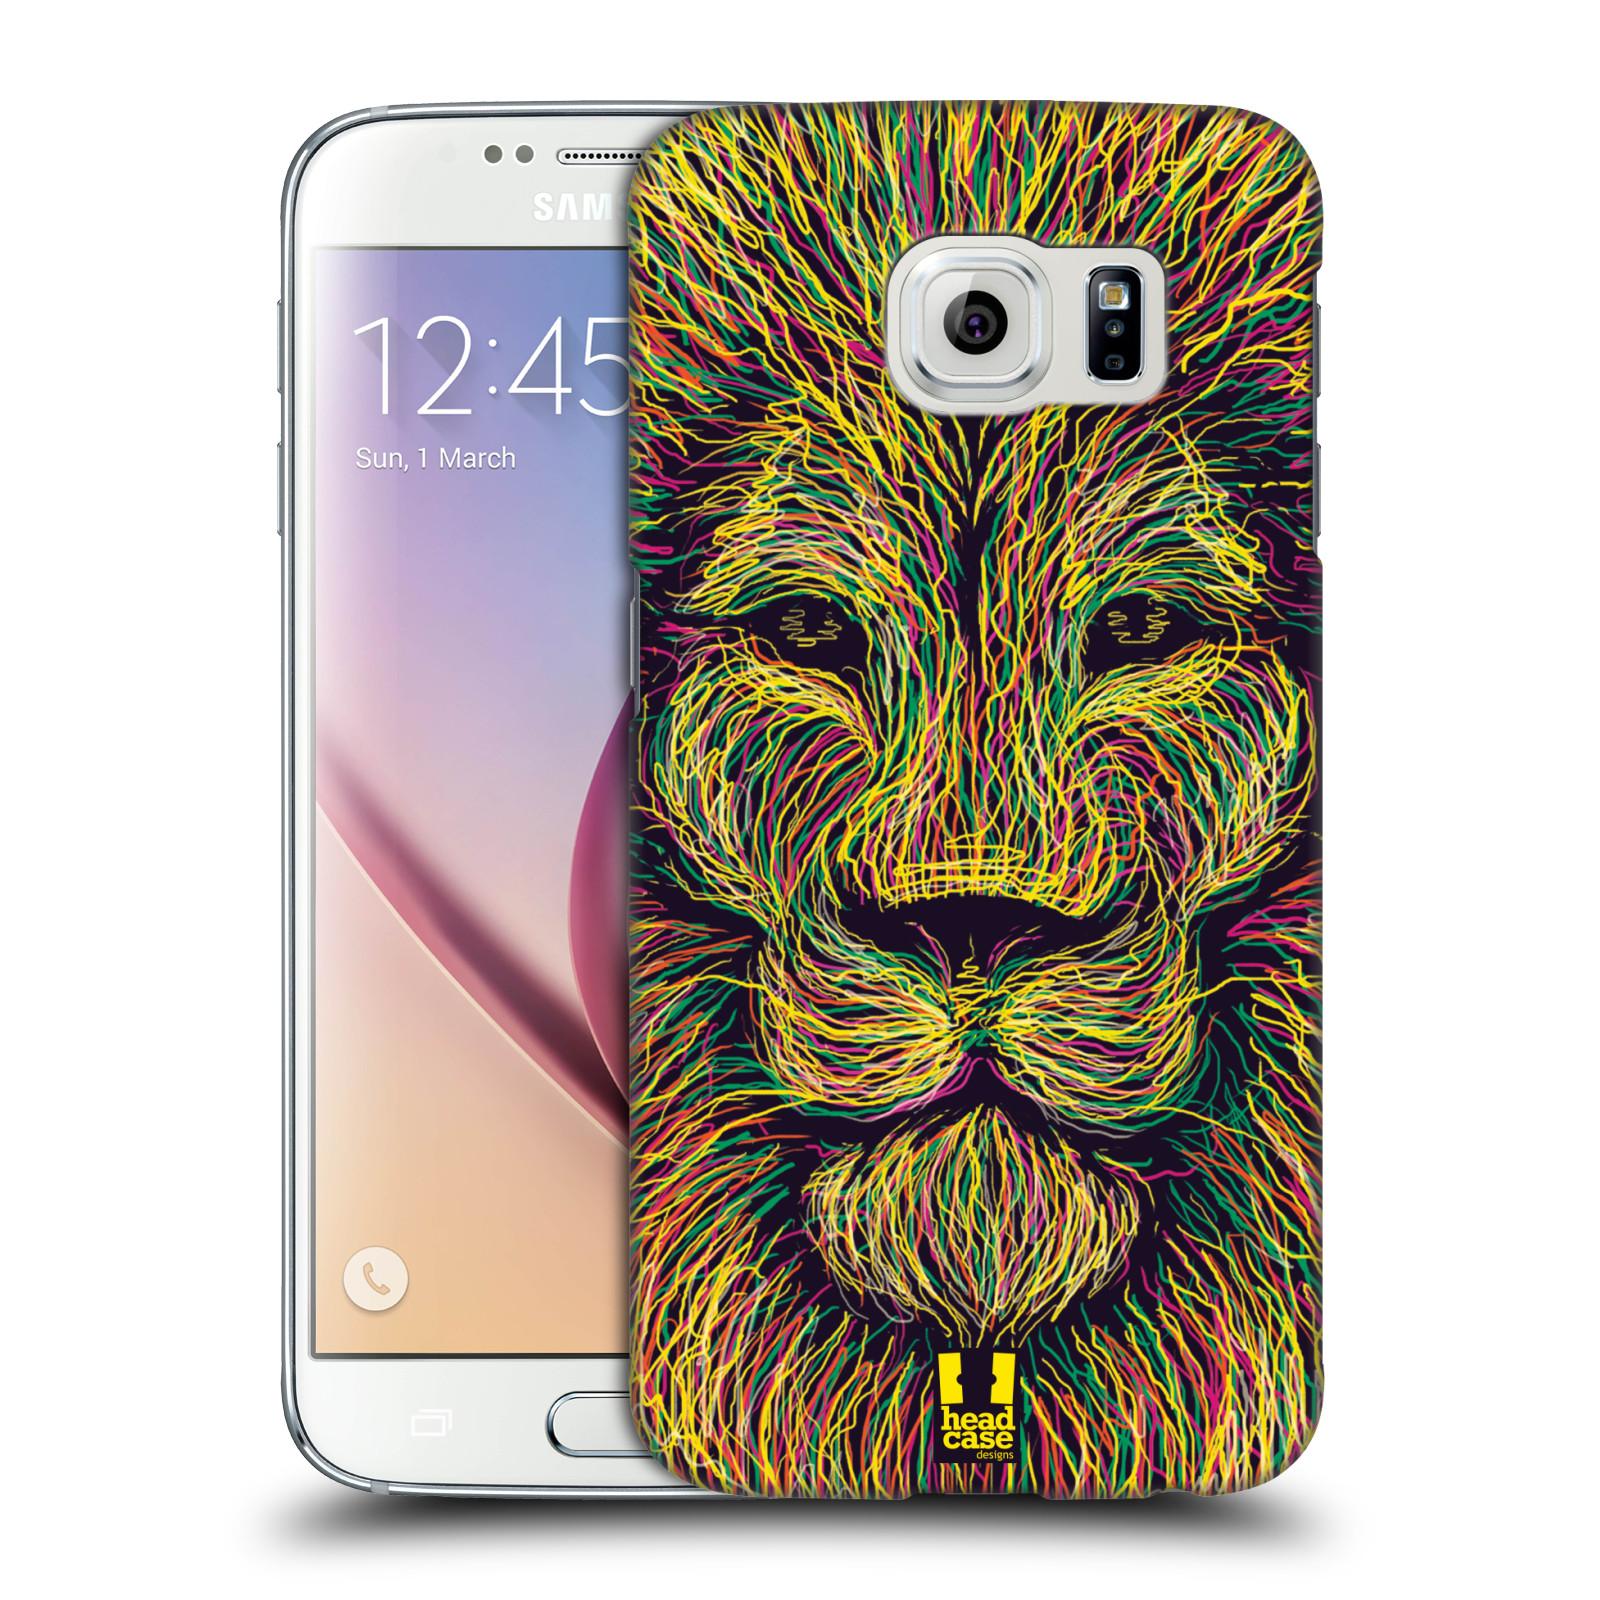 HEAD CASE plastový obal na mobil SAMSUNG Galaxy S6 (G9200, G920F) vzor zvíře čmáranice lev